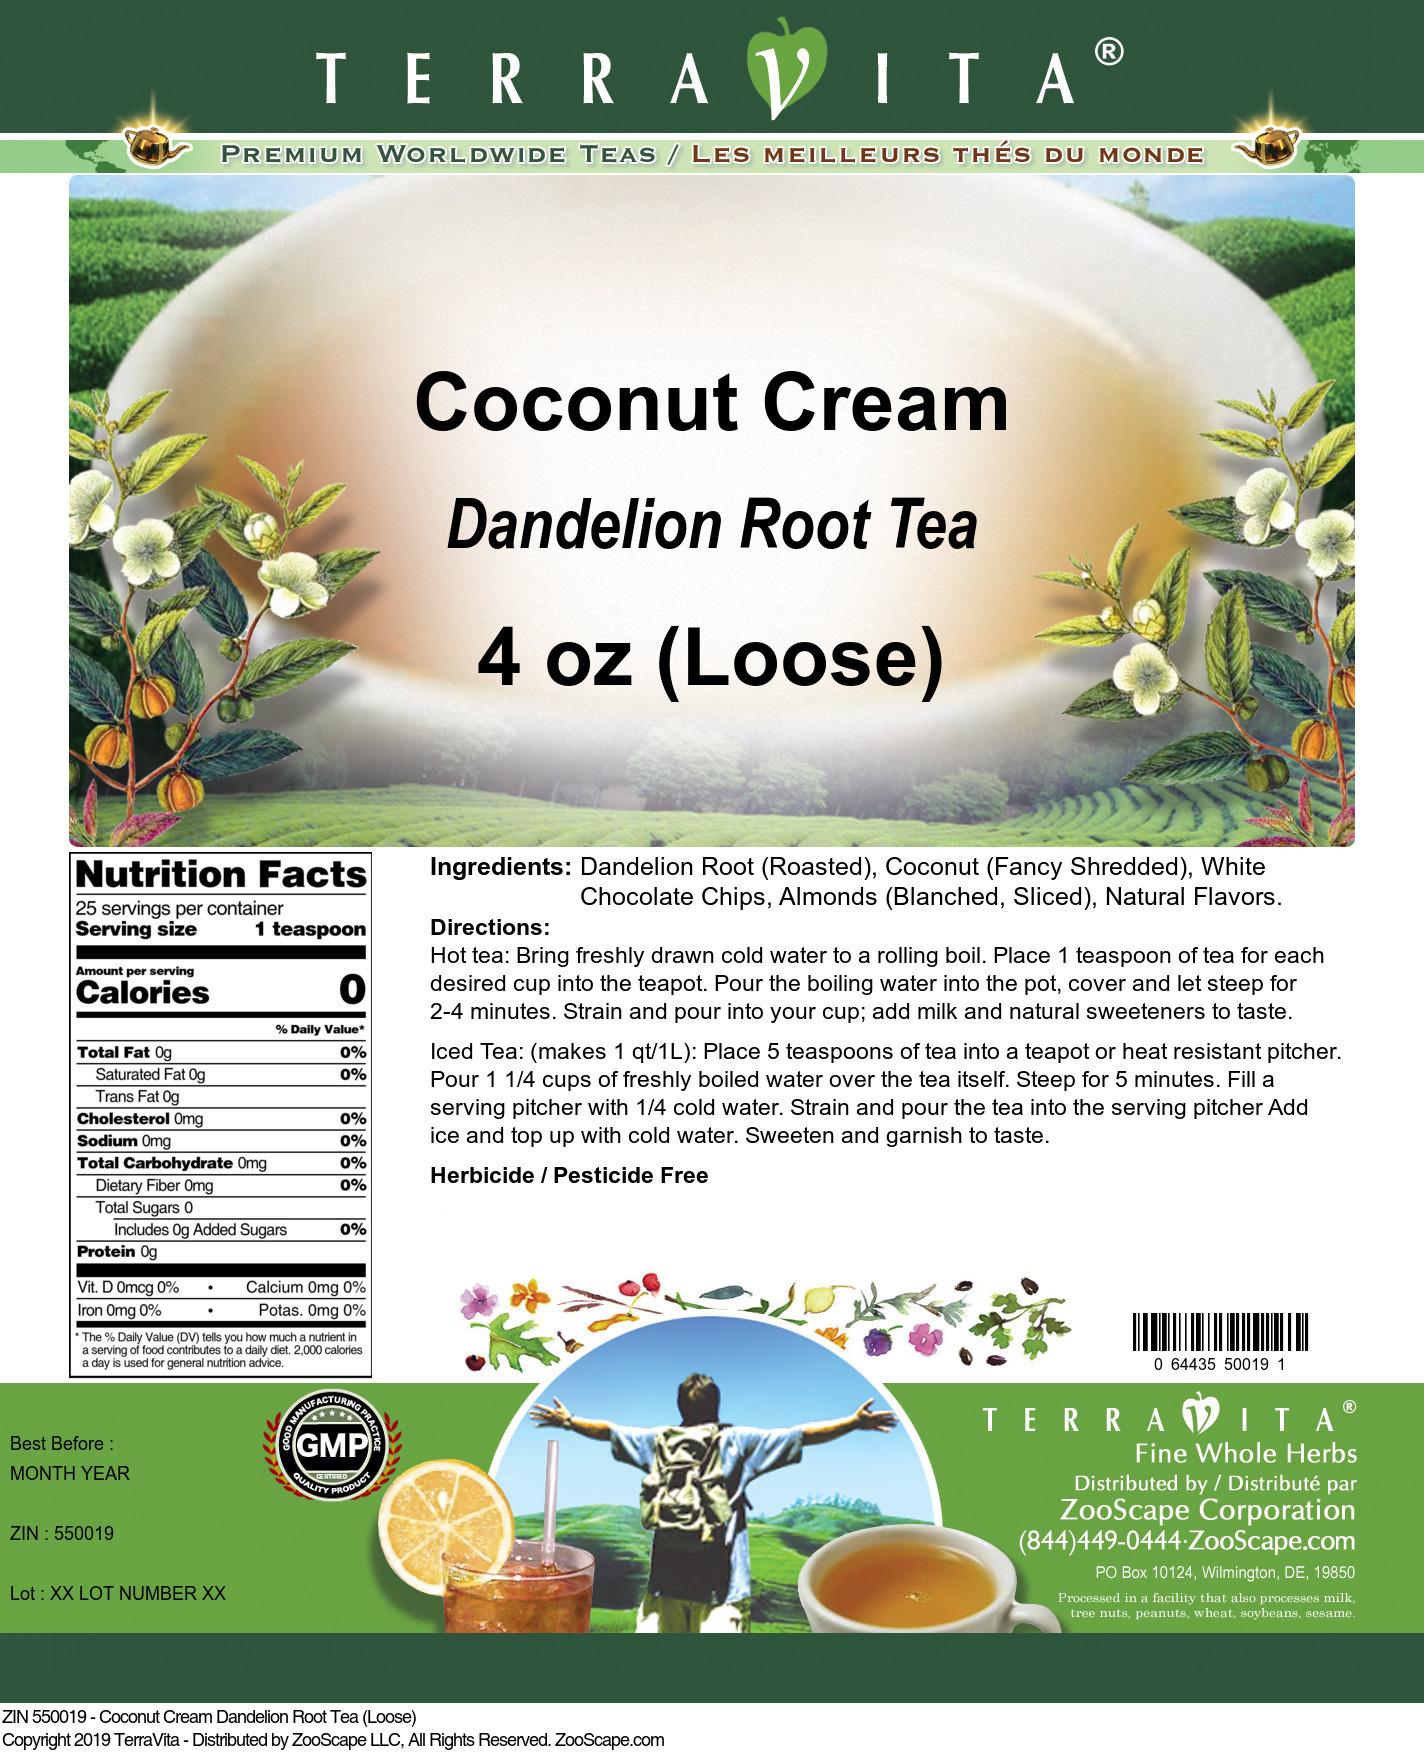 Coconut Cream Dandelion Root Tea (Loose)